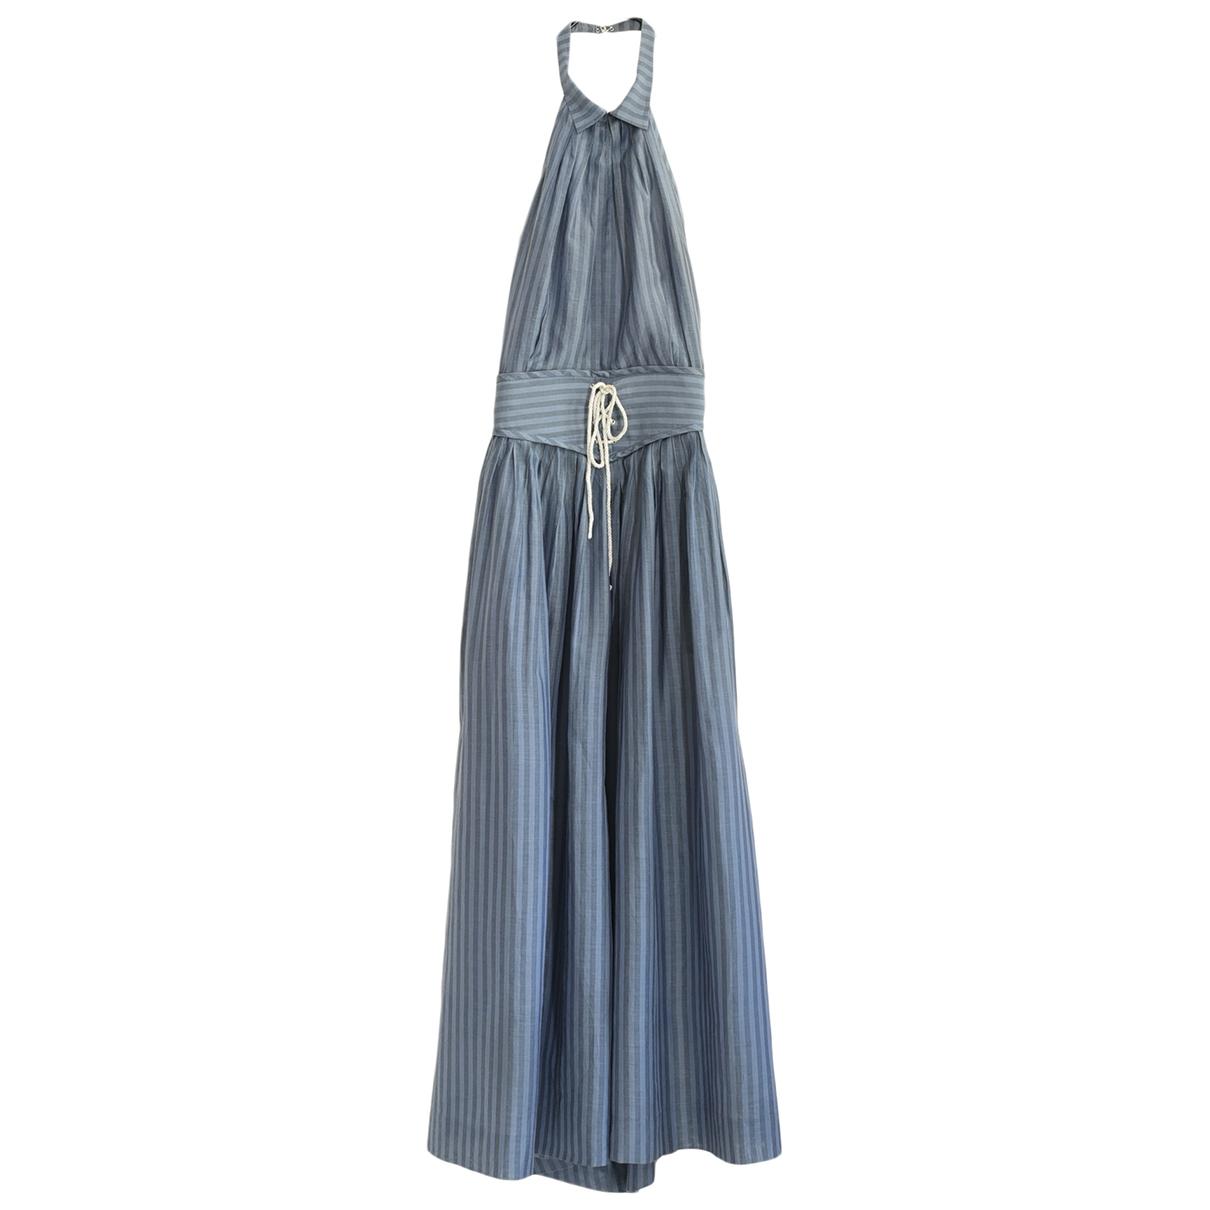 3.1 Phillip Lim \N Blue Silk dress for Women 4 US